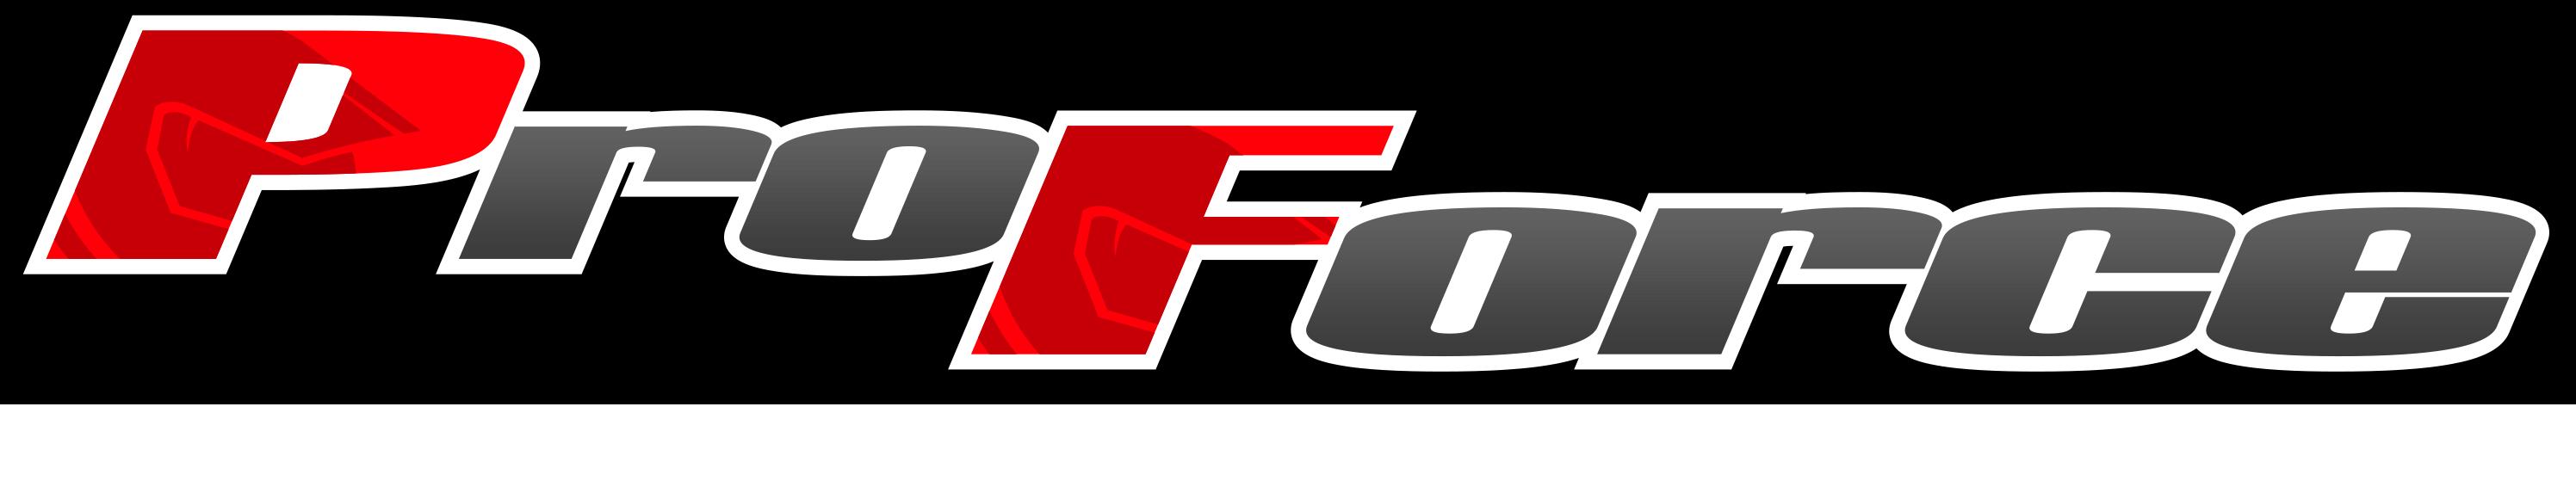 p force logo